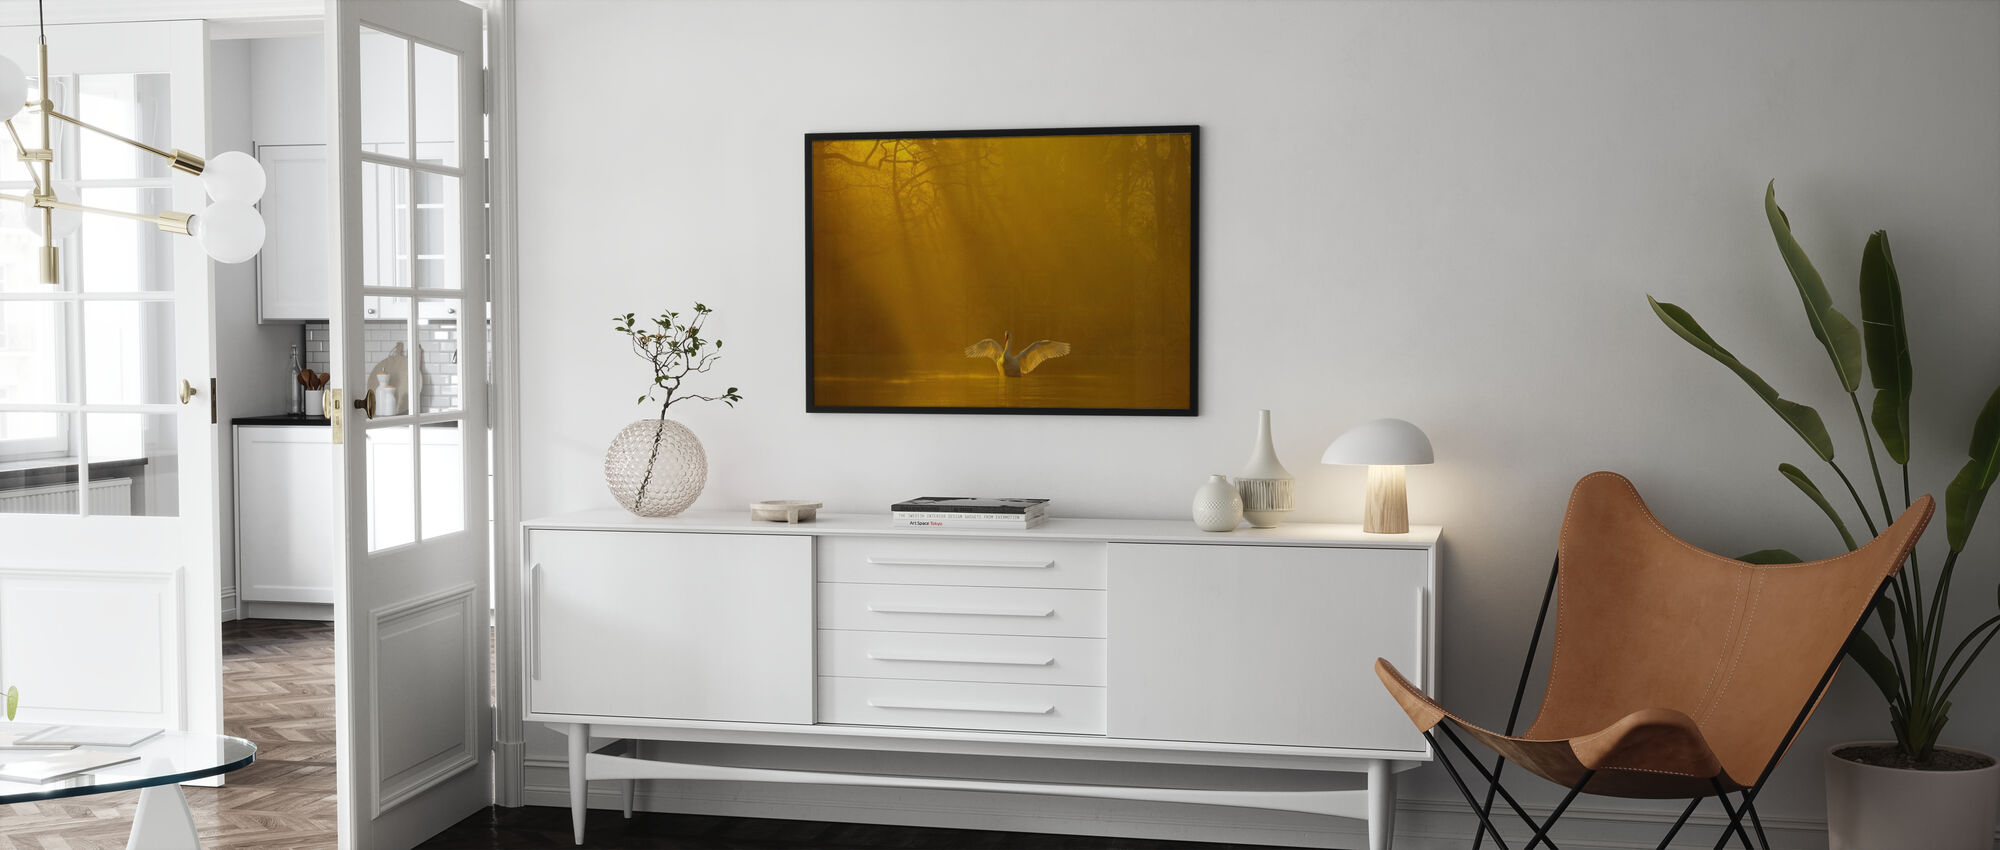 Lago Cisne Dorado - Print enmarcado - Salón